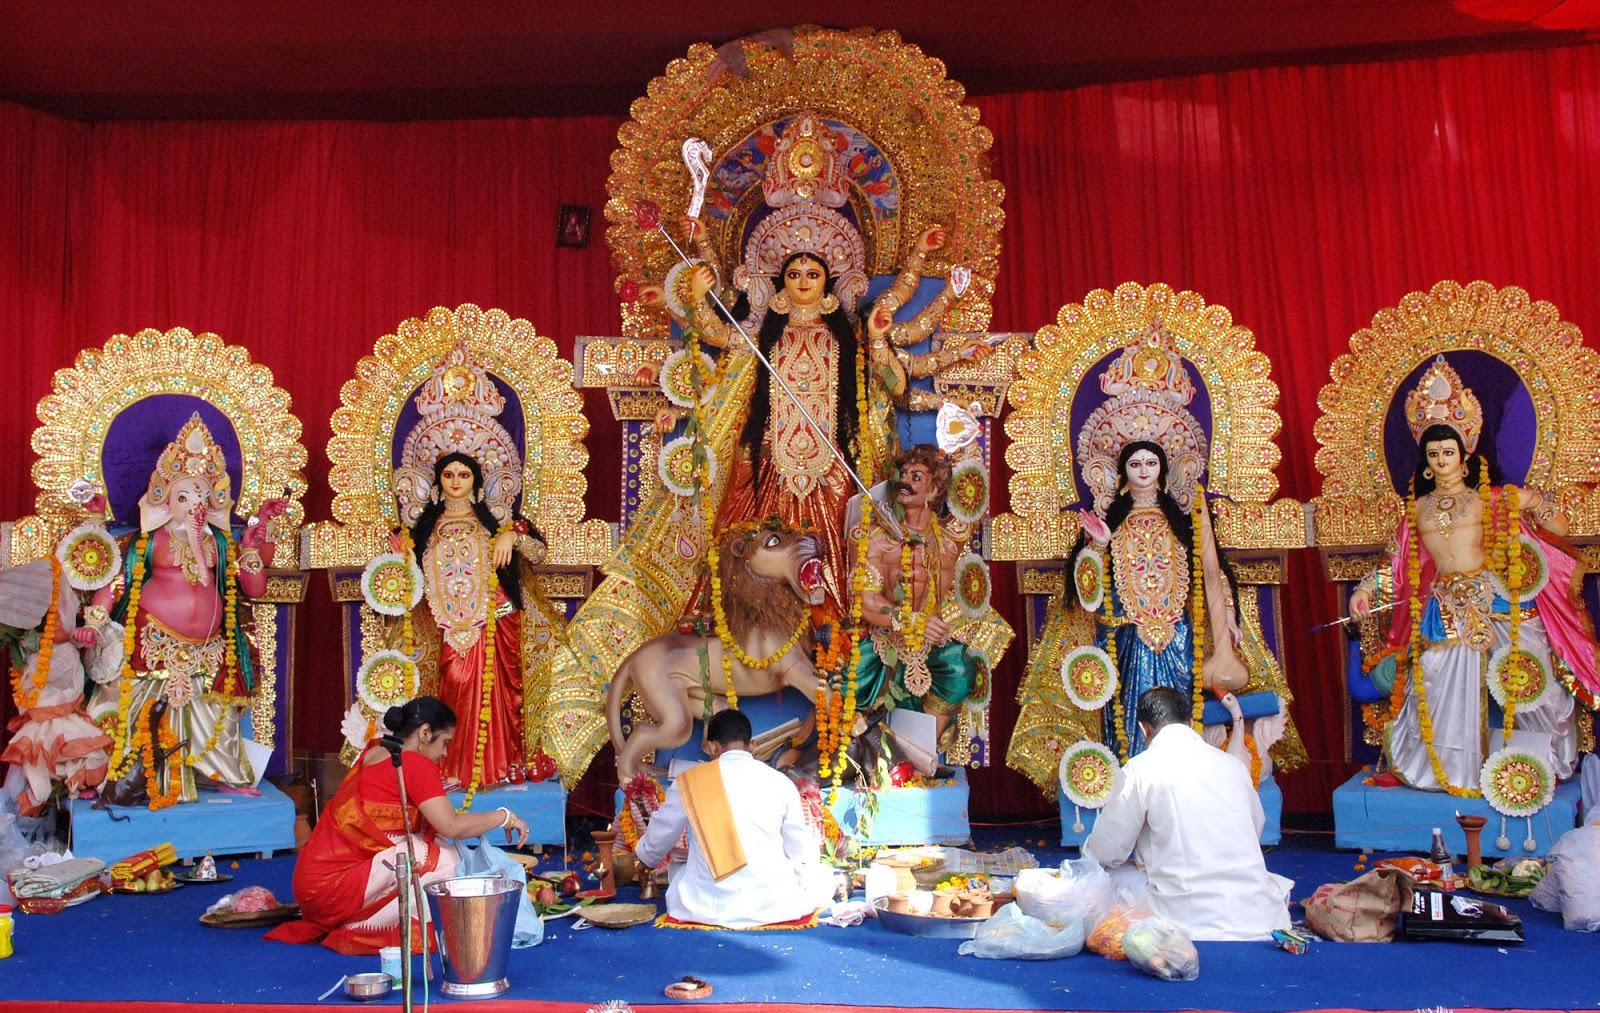 Devotional Wallpapers World: mahalaya Mata Rani HD ...